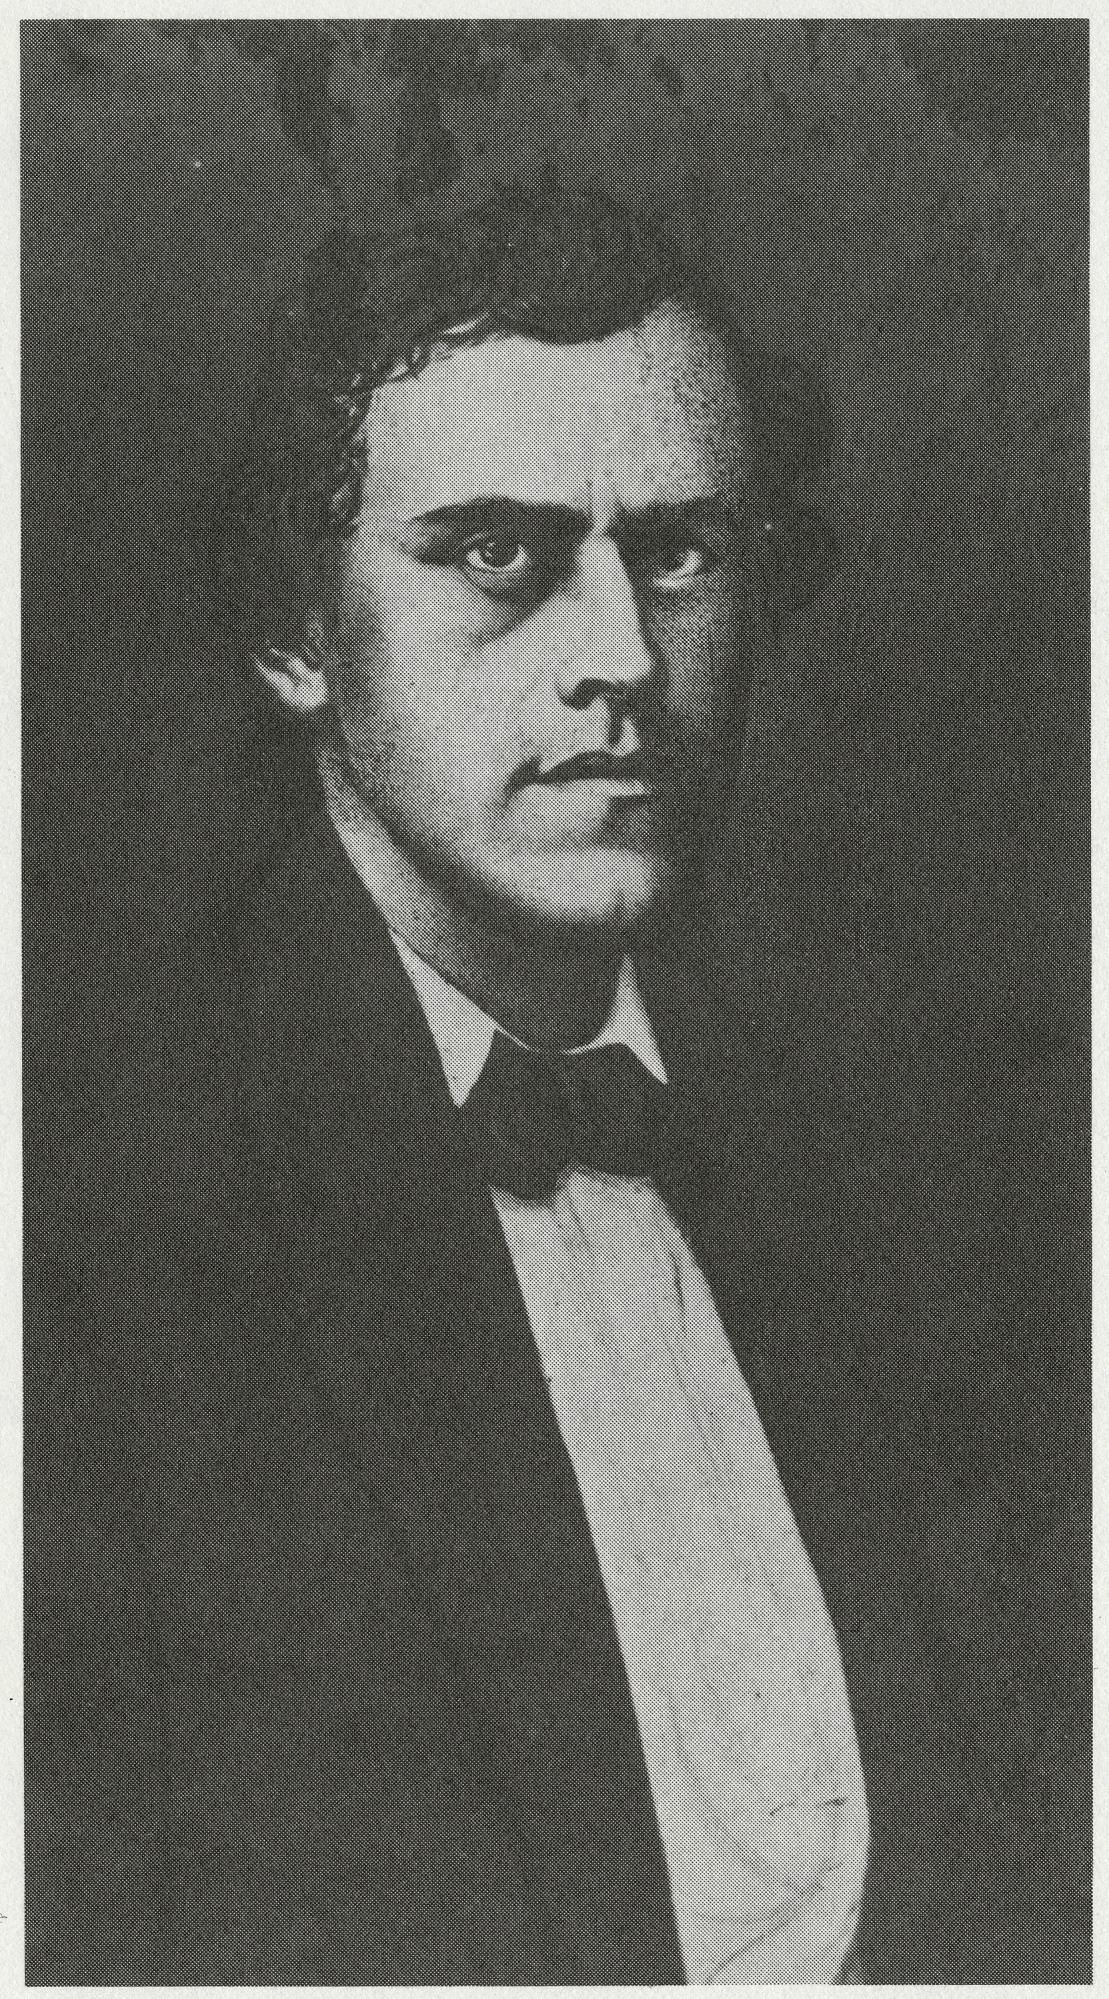 John Robert Buhler